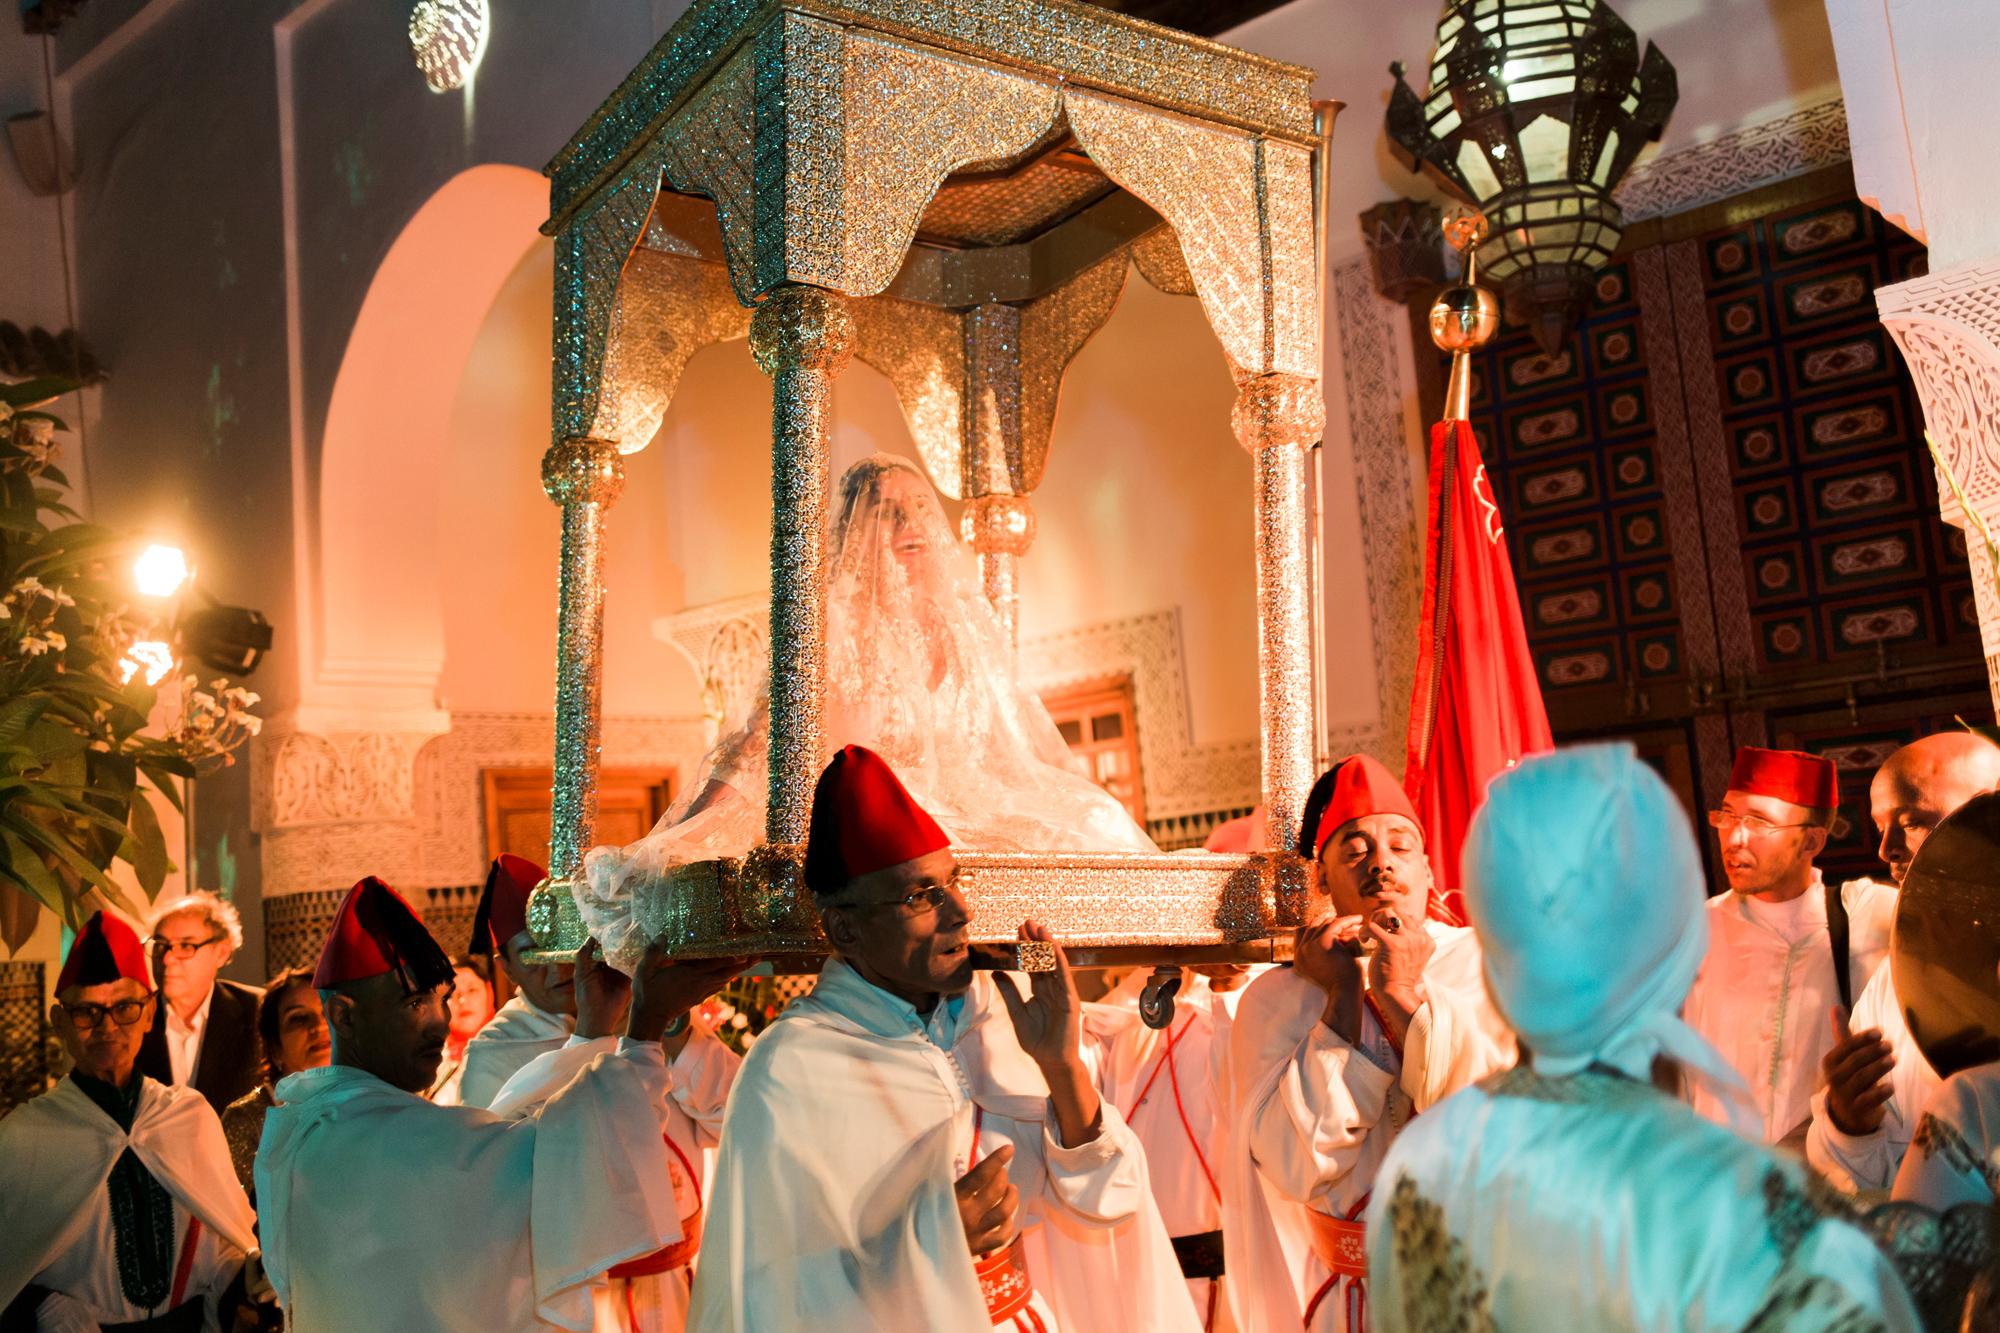 marrakech-morocco-destination-wedding-lilouette-23.jpg